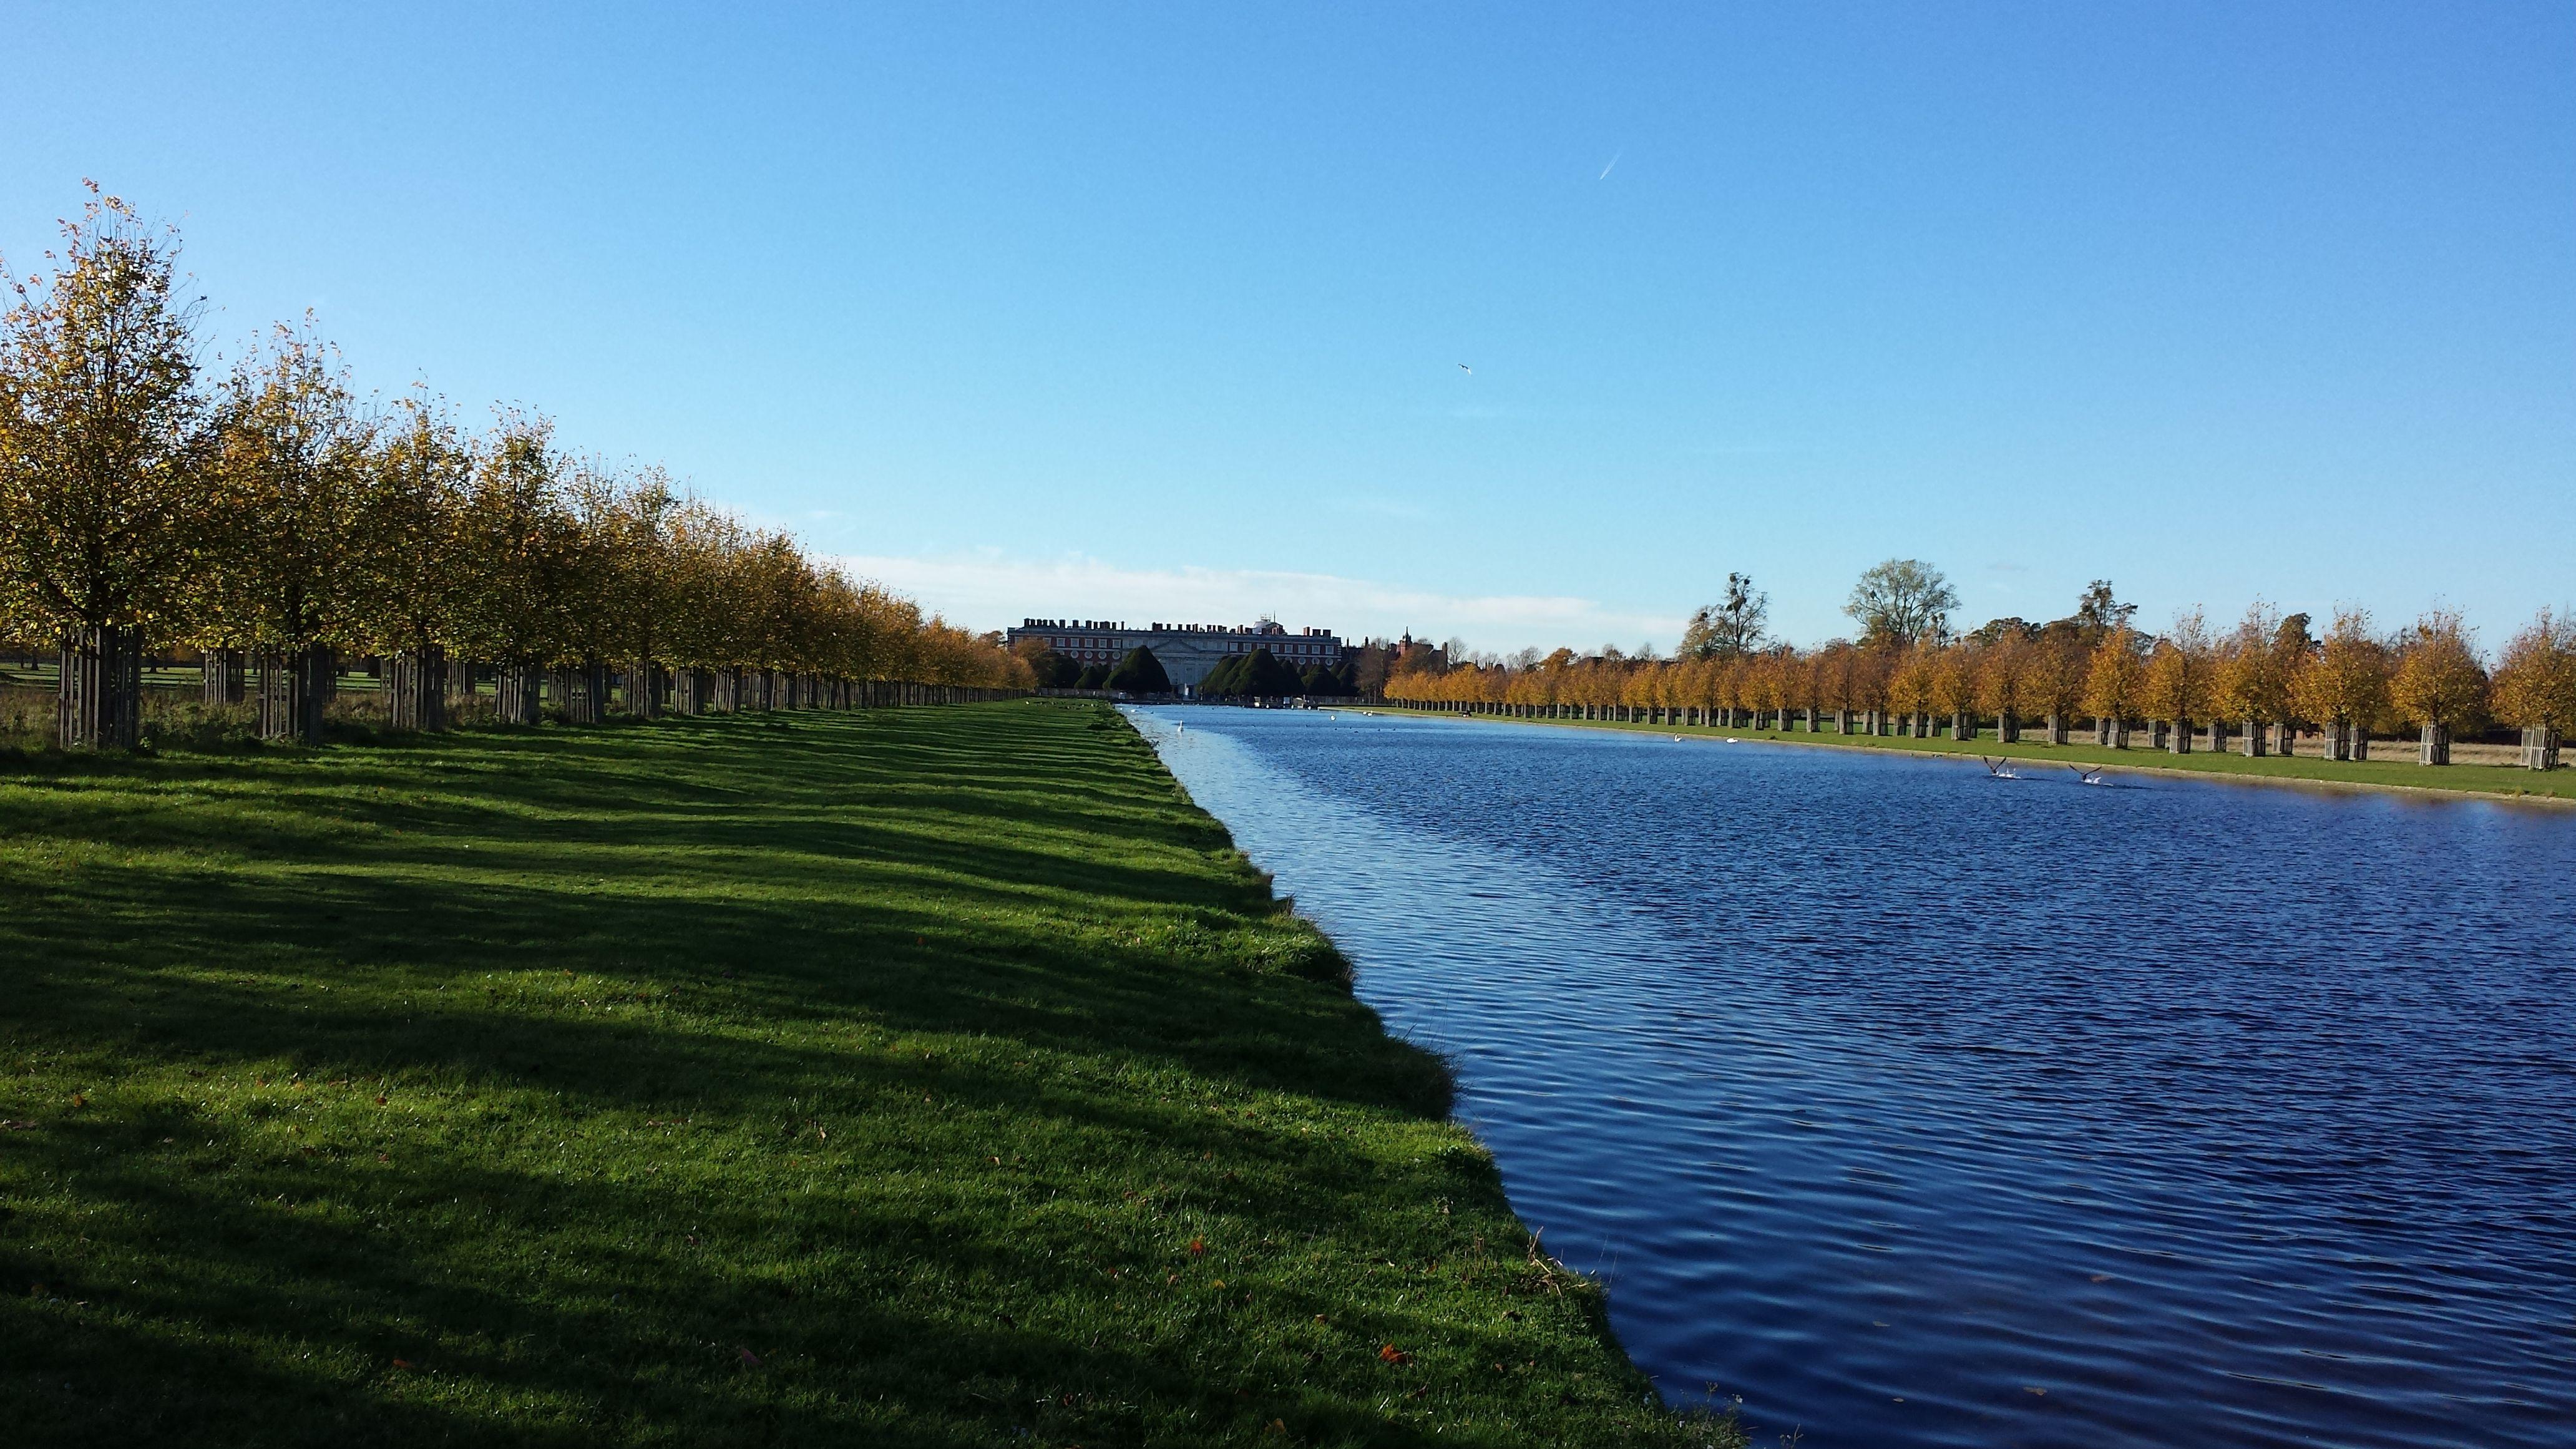 The Long Water Looking Towards Hampton Court Palace